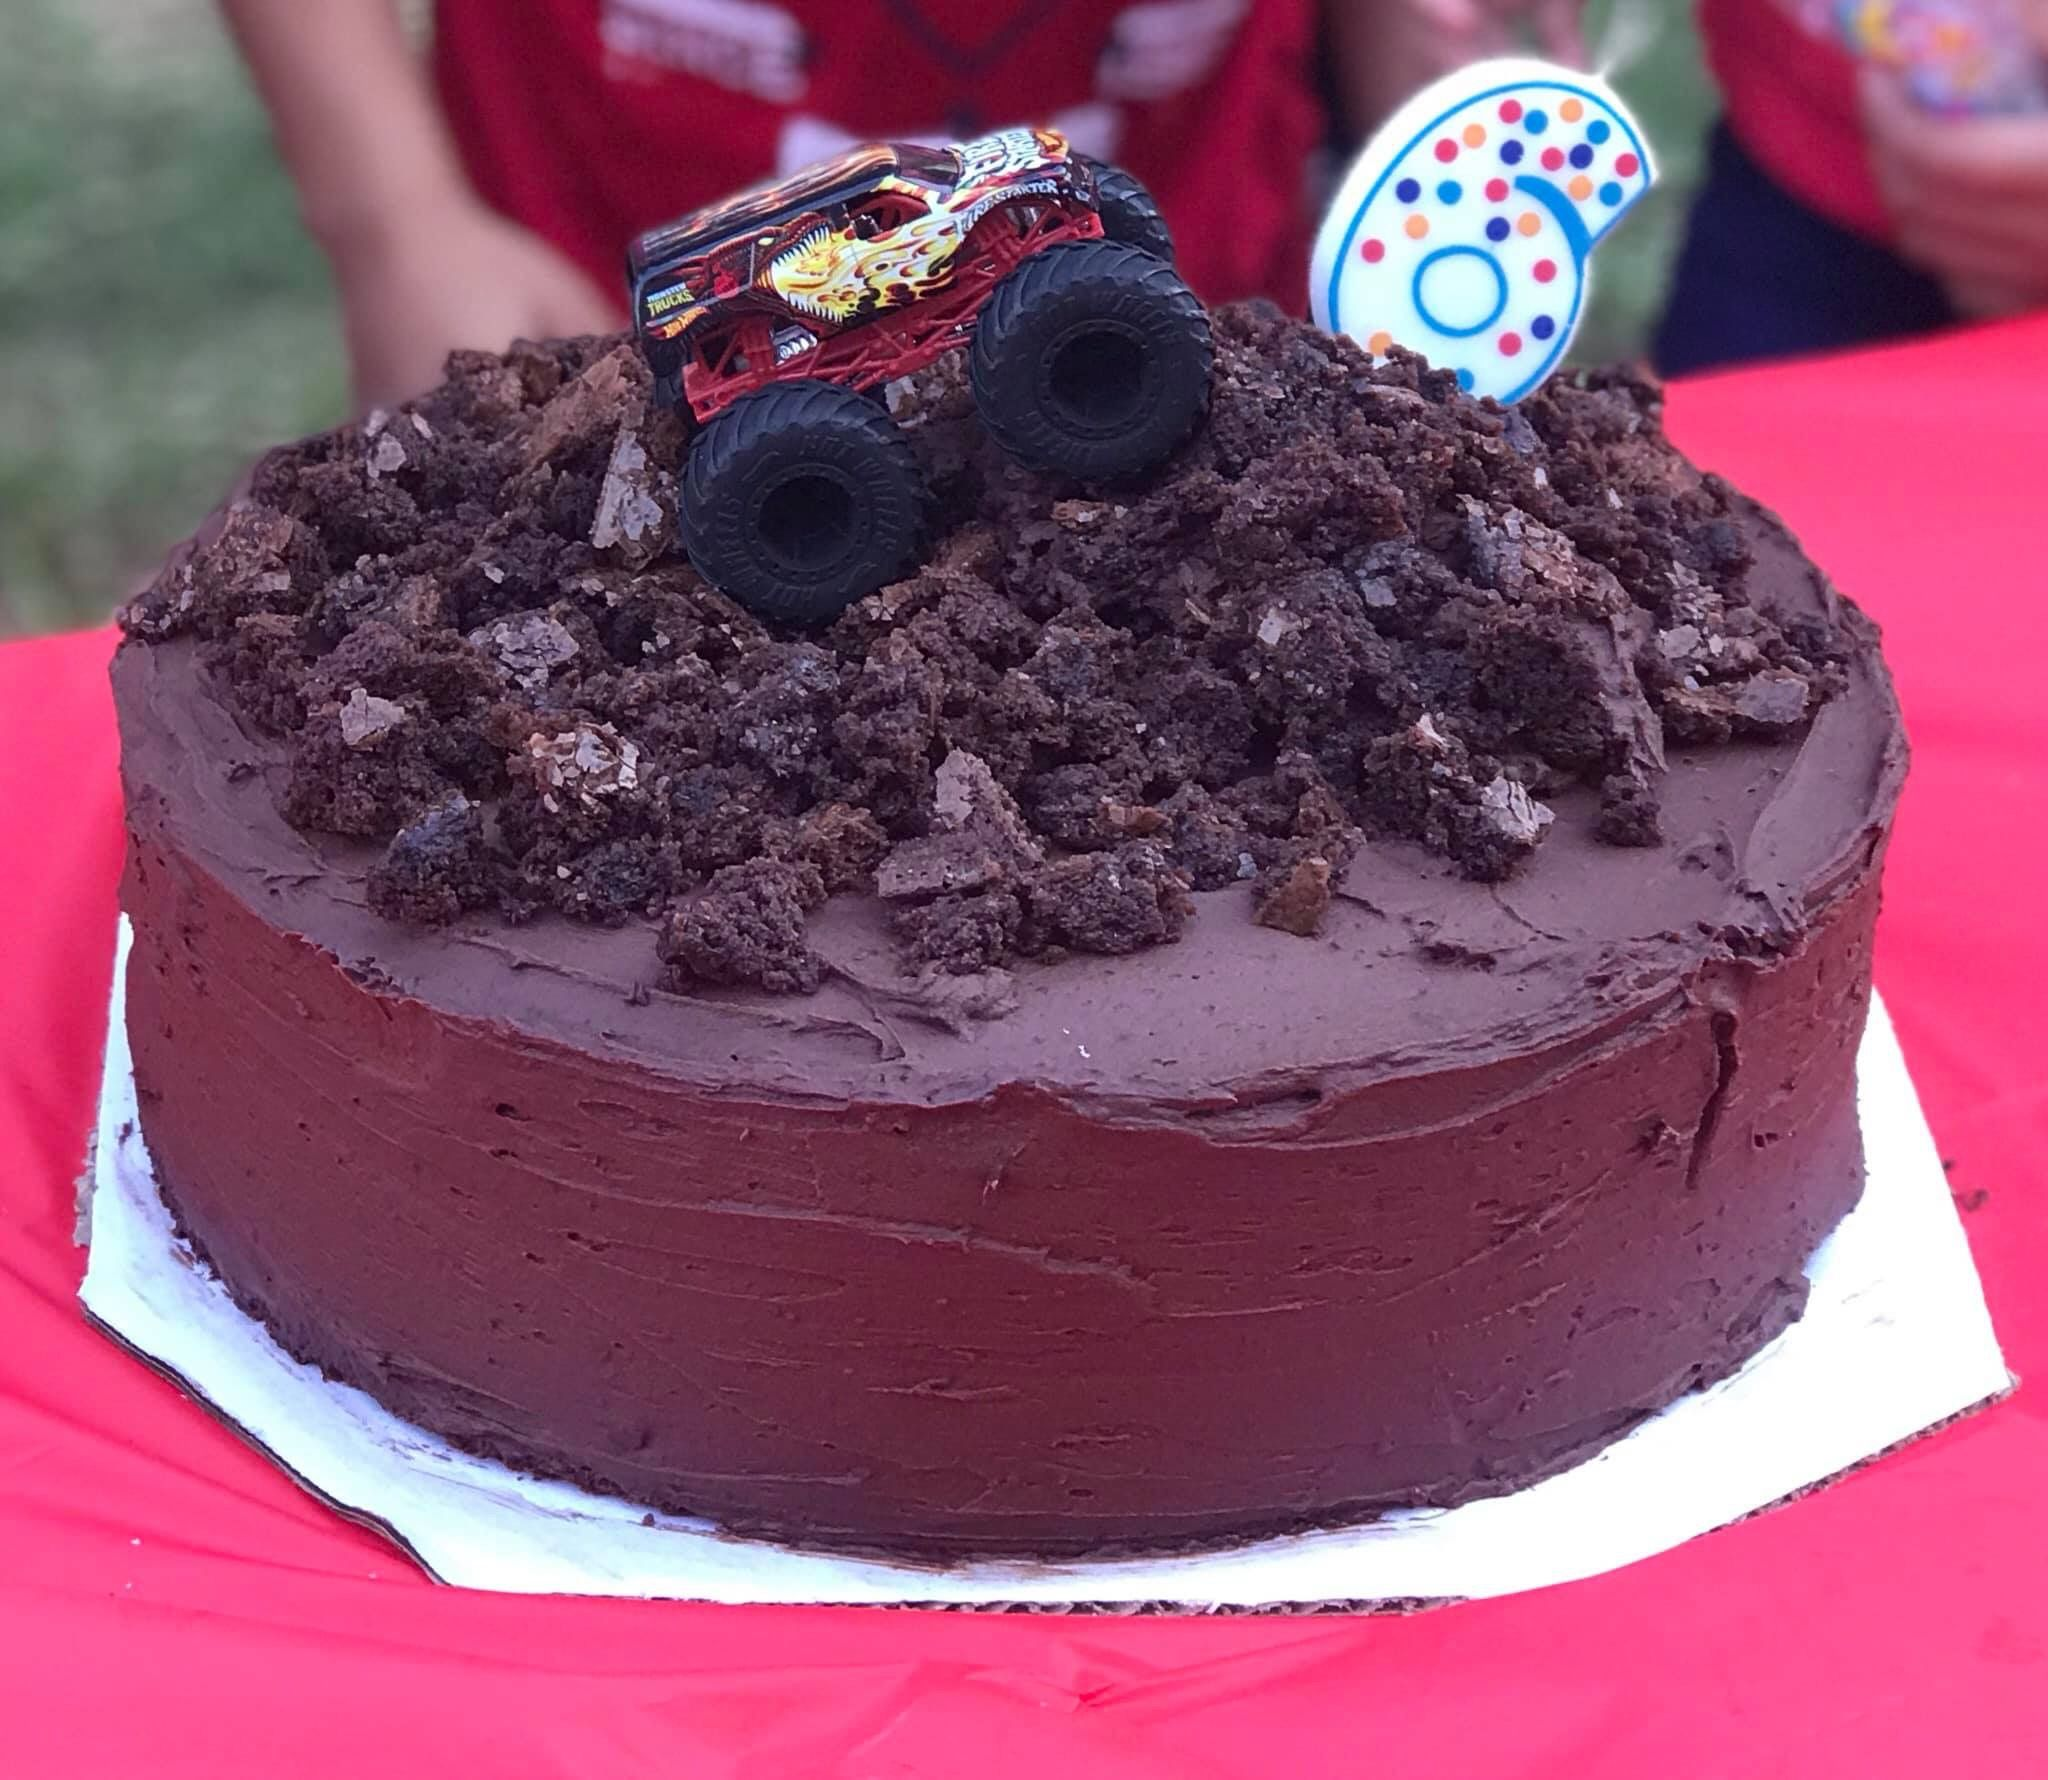 Chocolate monster truck cake i made for my nephews sixth